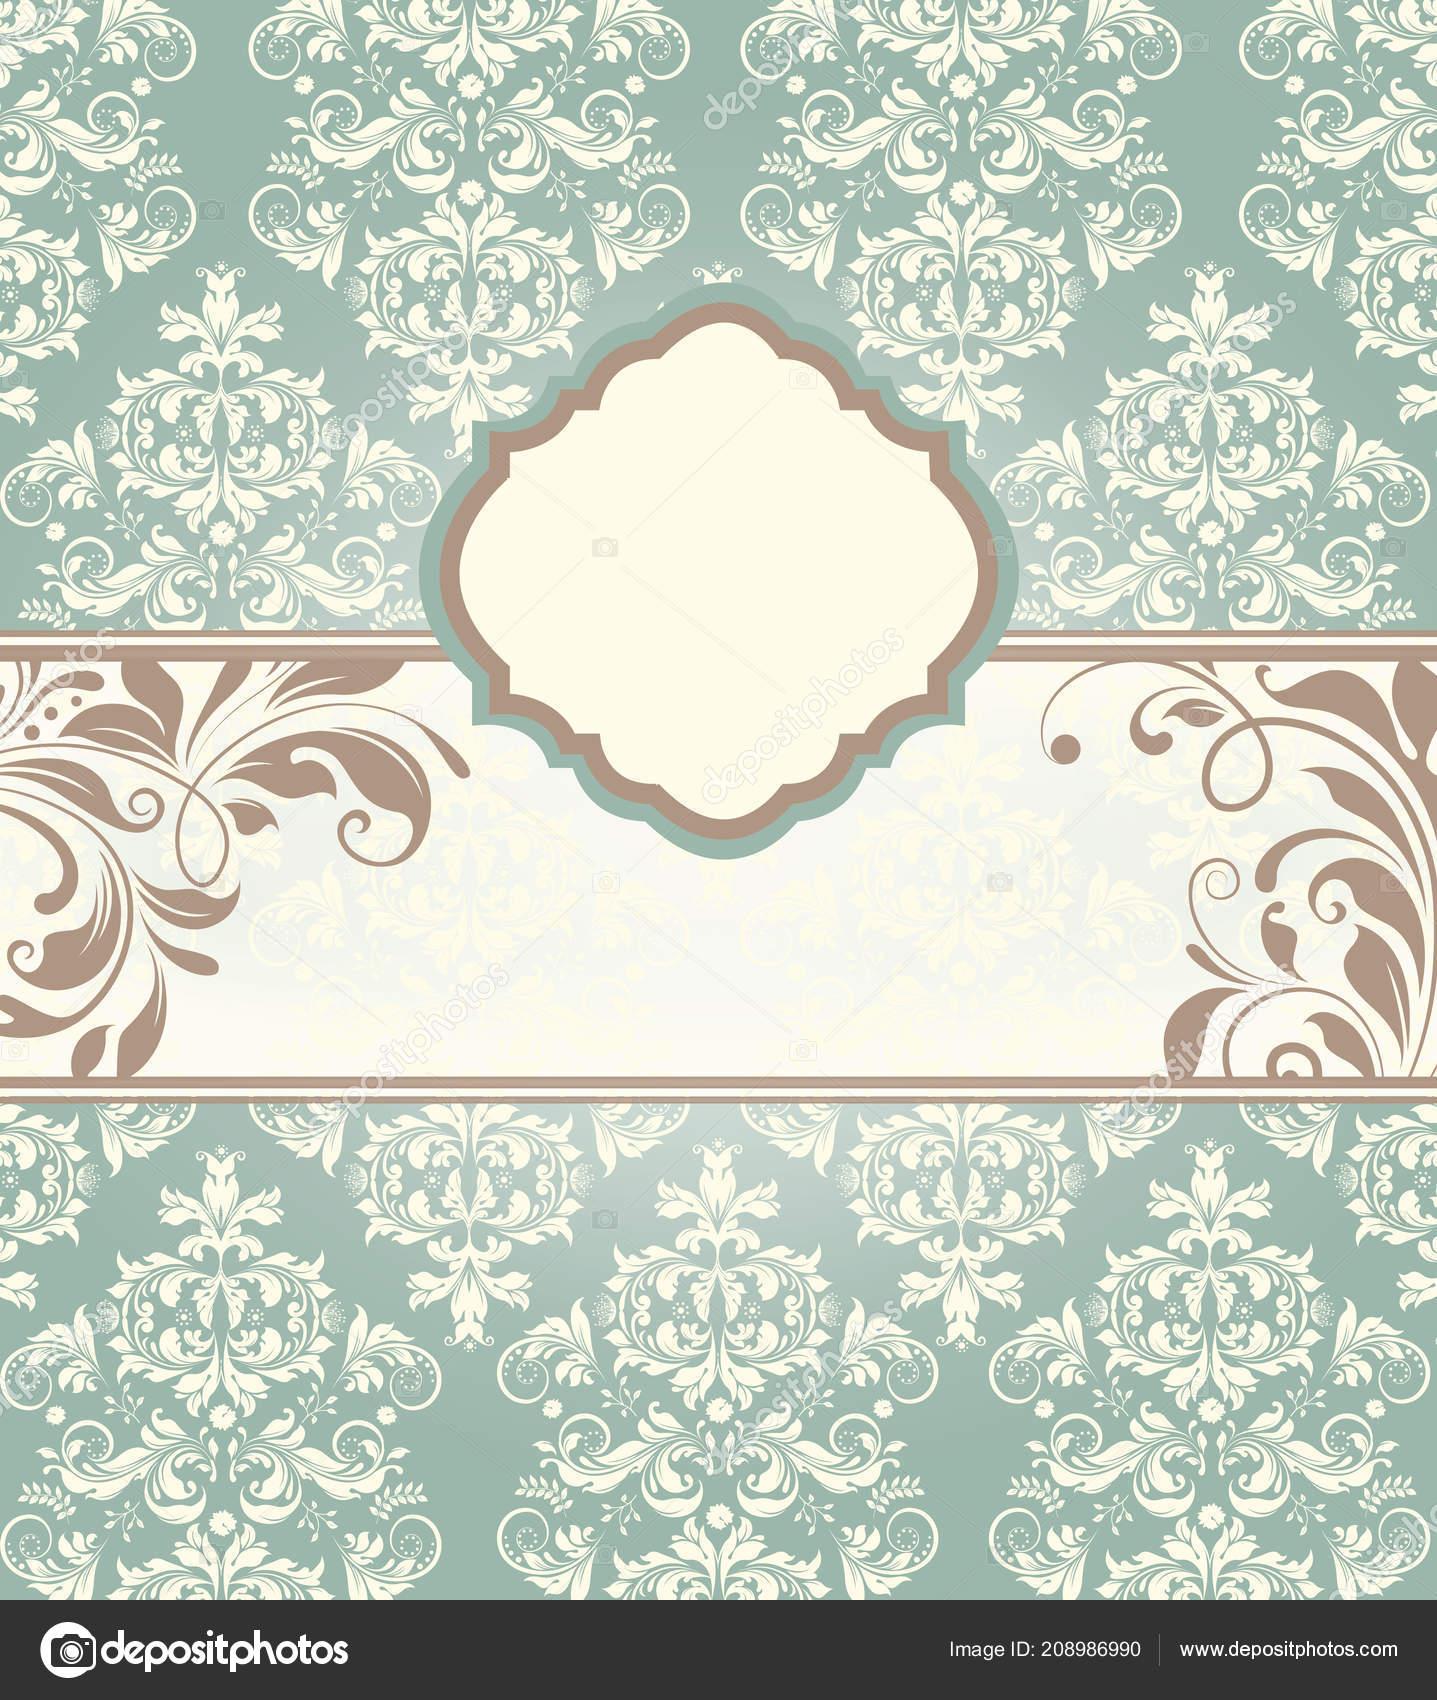 Vintage Invitation Card Ornate Elegant Abstract Floral Design Light Brown Stock Vector C Morphart 208986990